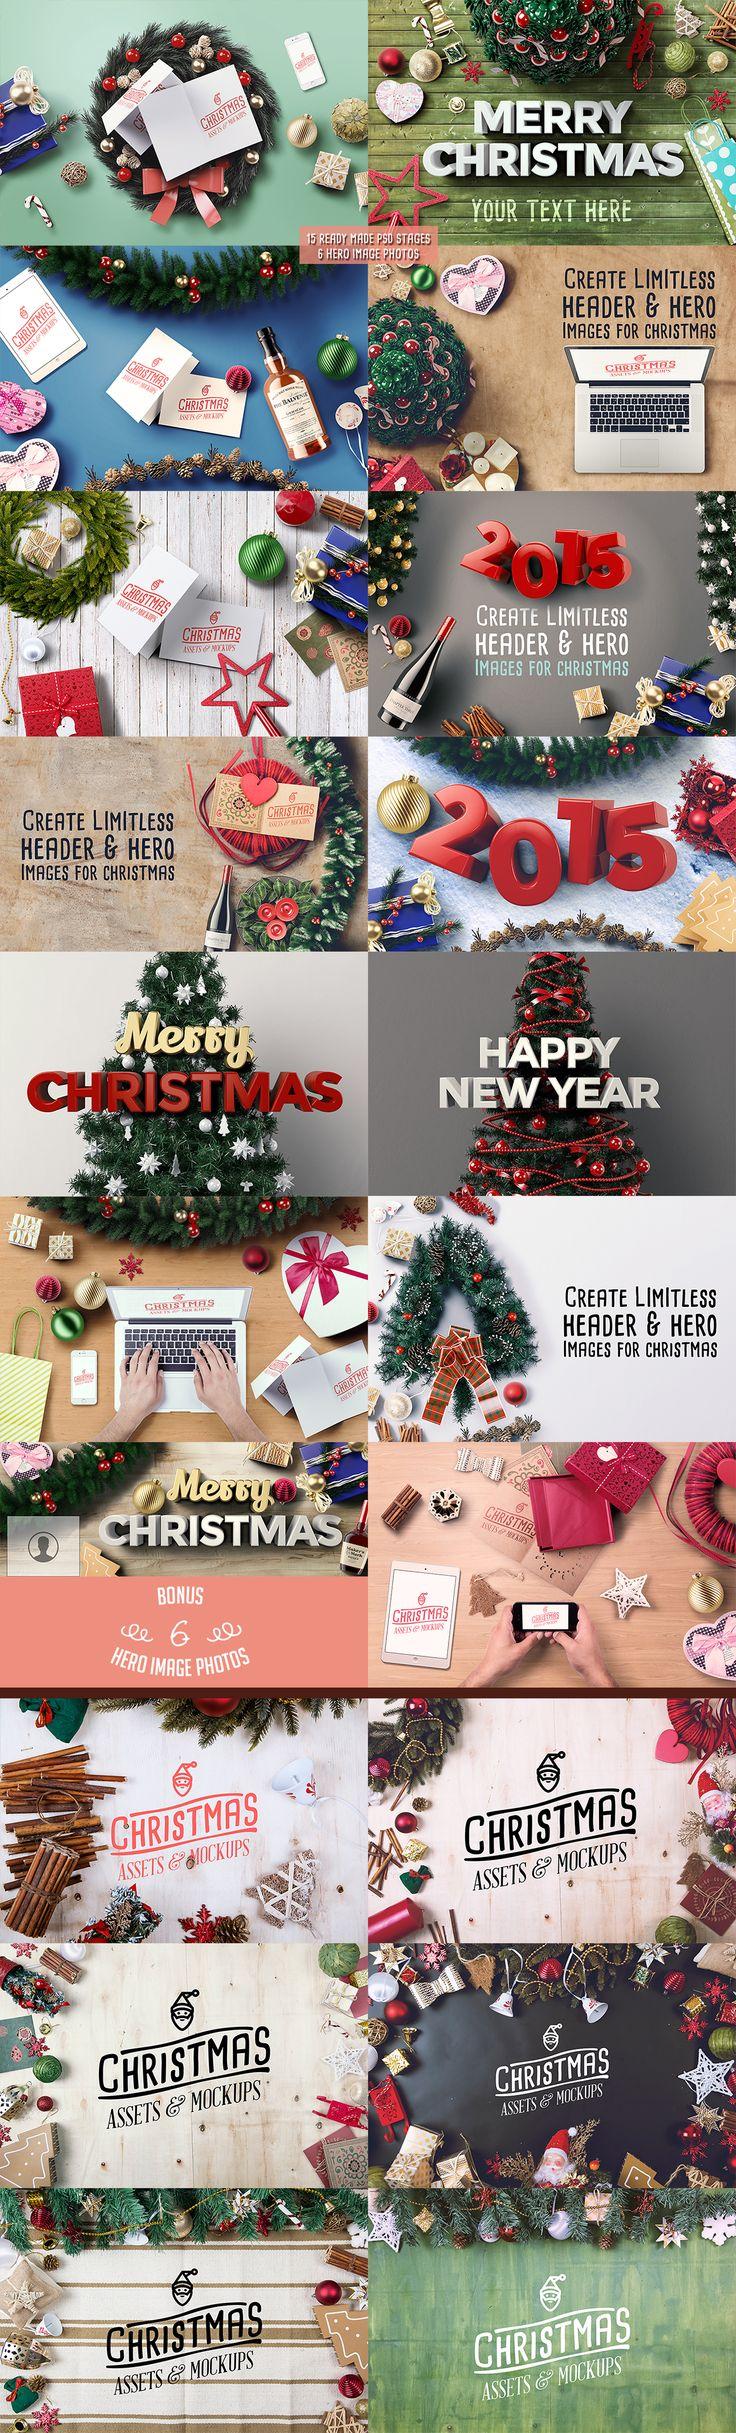 Christmas Assets & Mock Ups by Mockup Zone on Creative Market